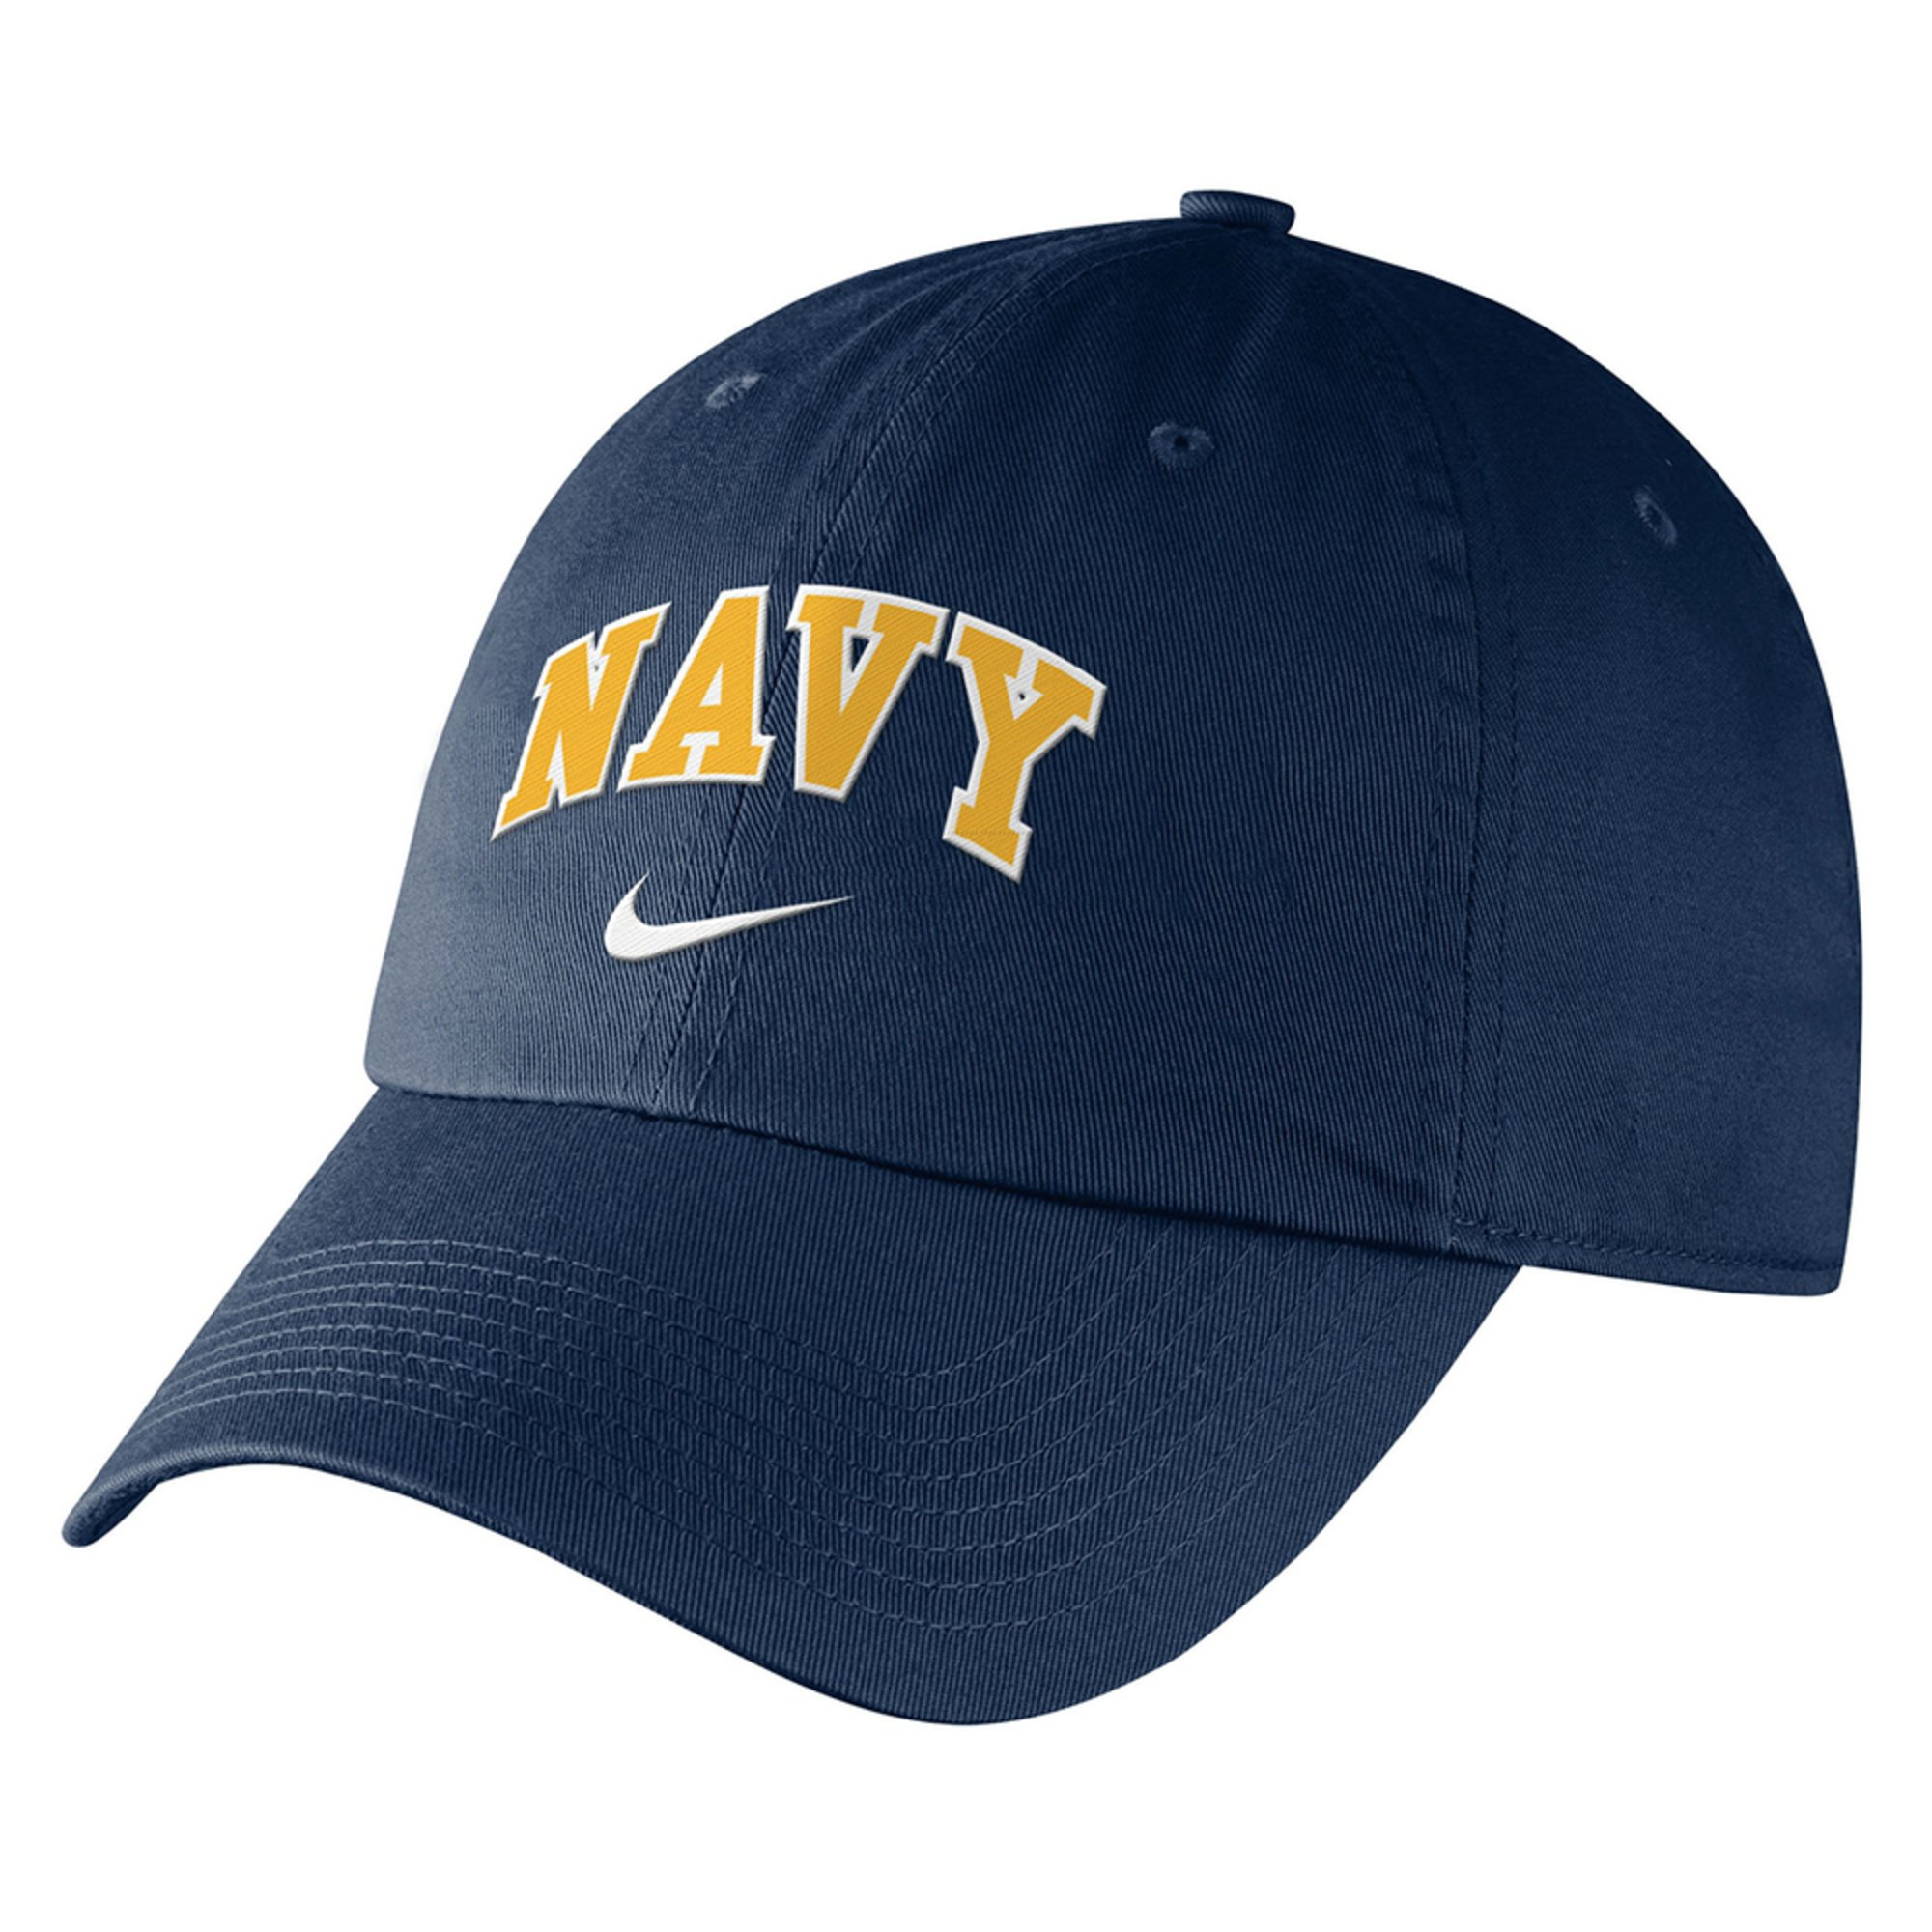 99ba9a7275f Nike. Nike Men s USN Campus Hat ...